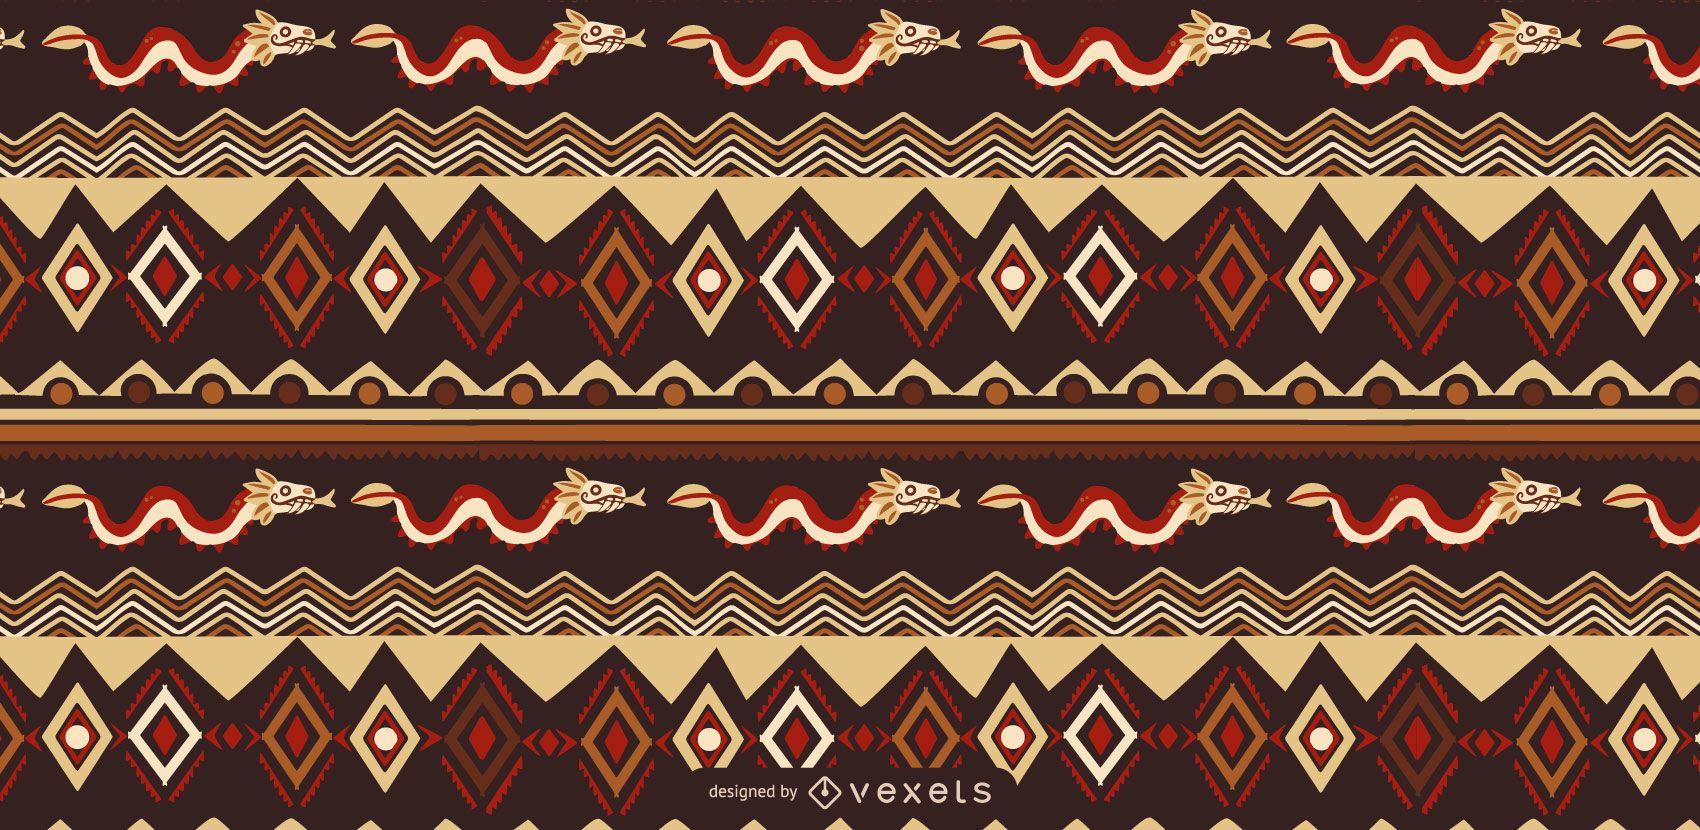 Aztec Style Pattern Design